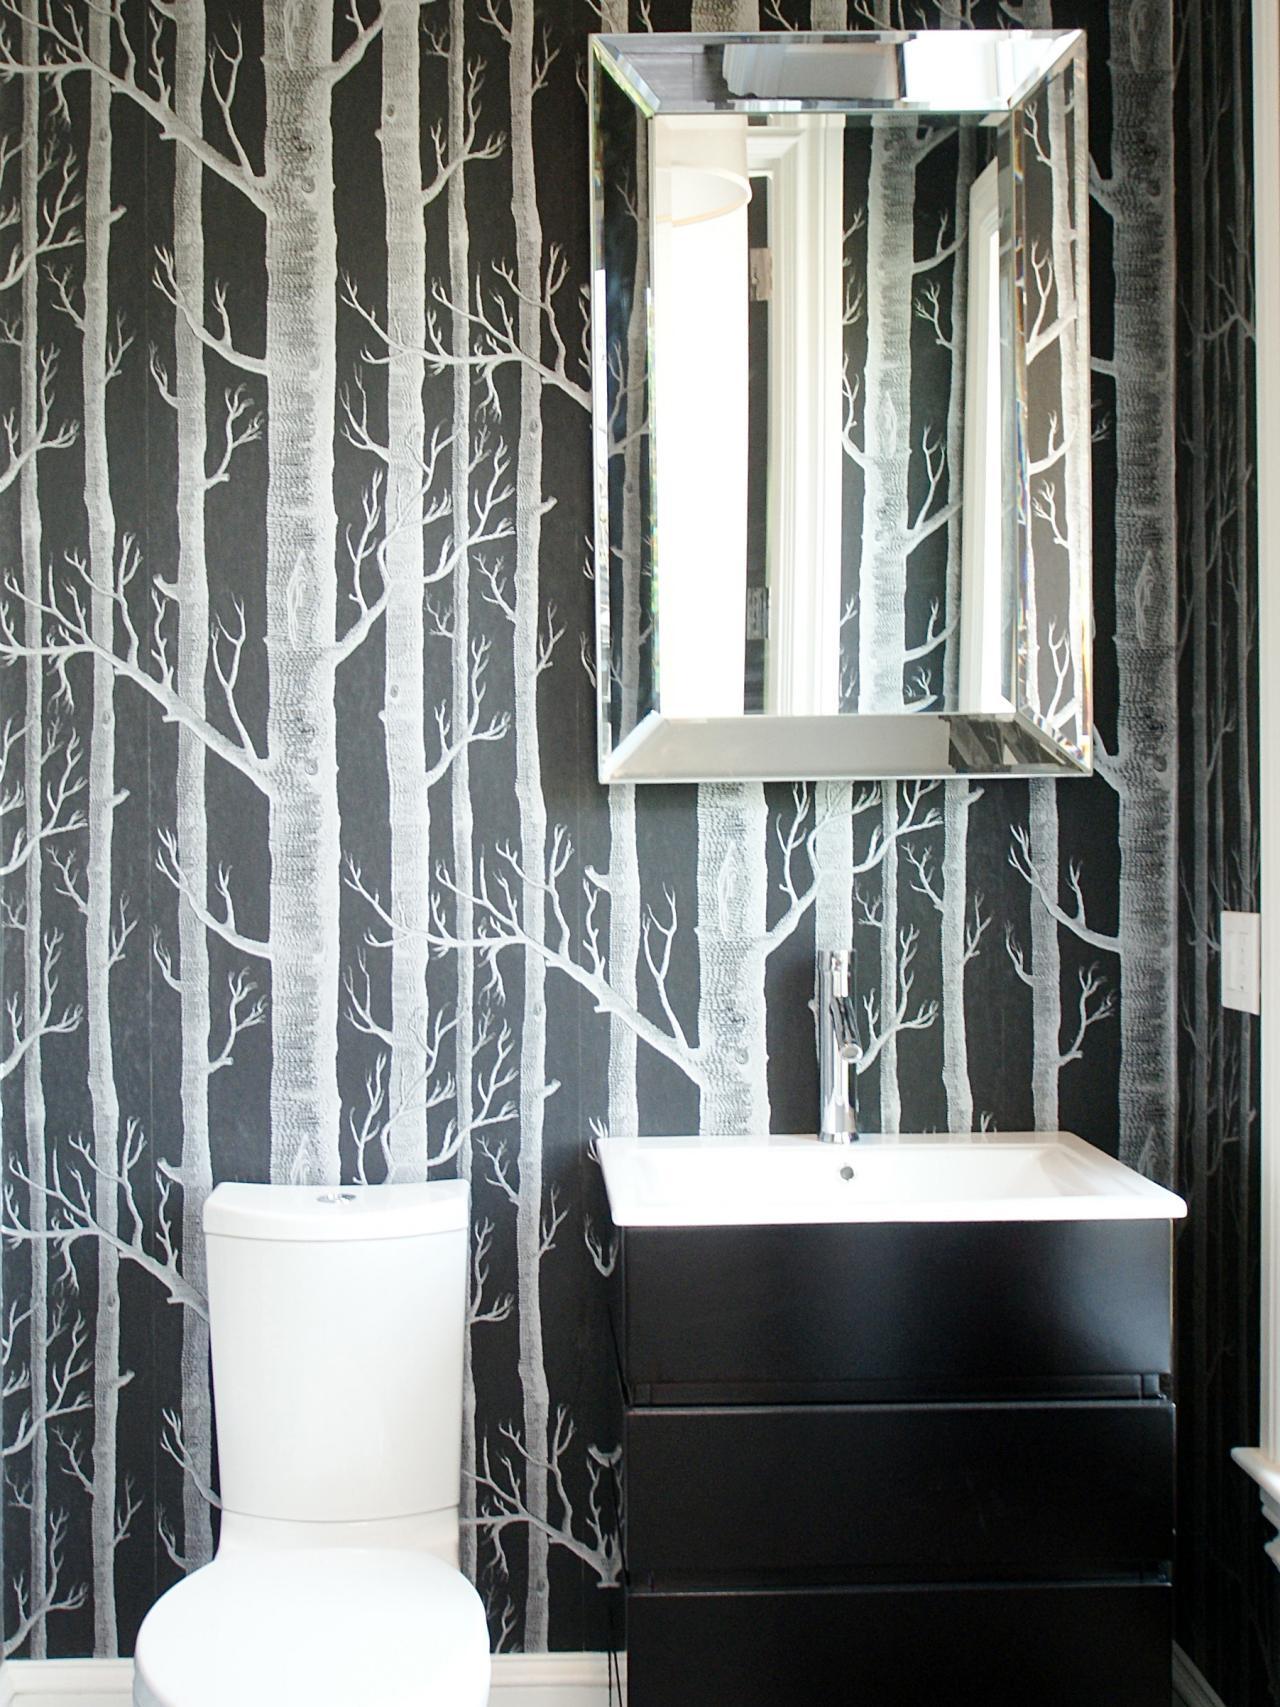 20 Small Bathroom Design Ideas Bathroom Ideas Designs HGTV 1280x1707